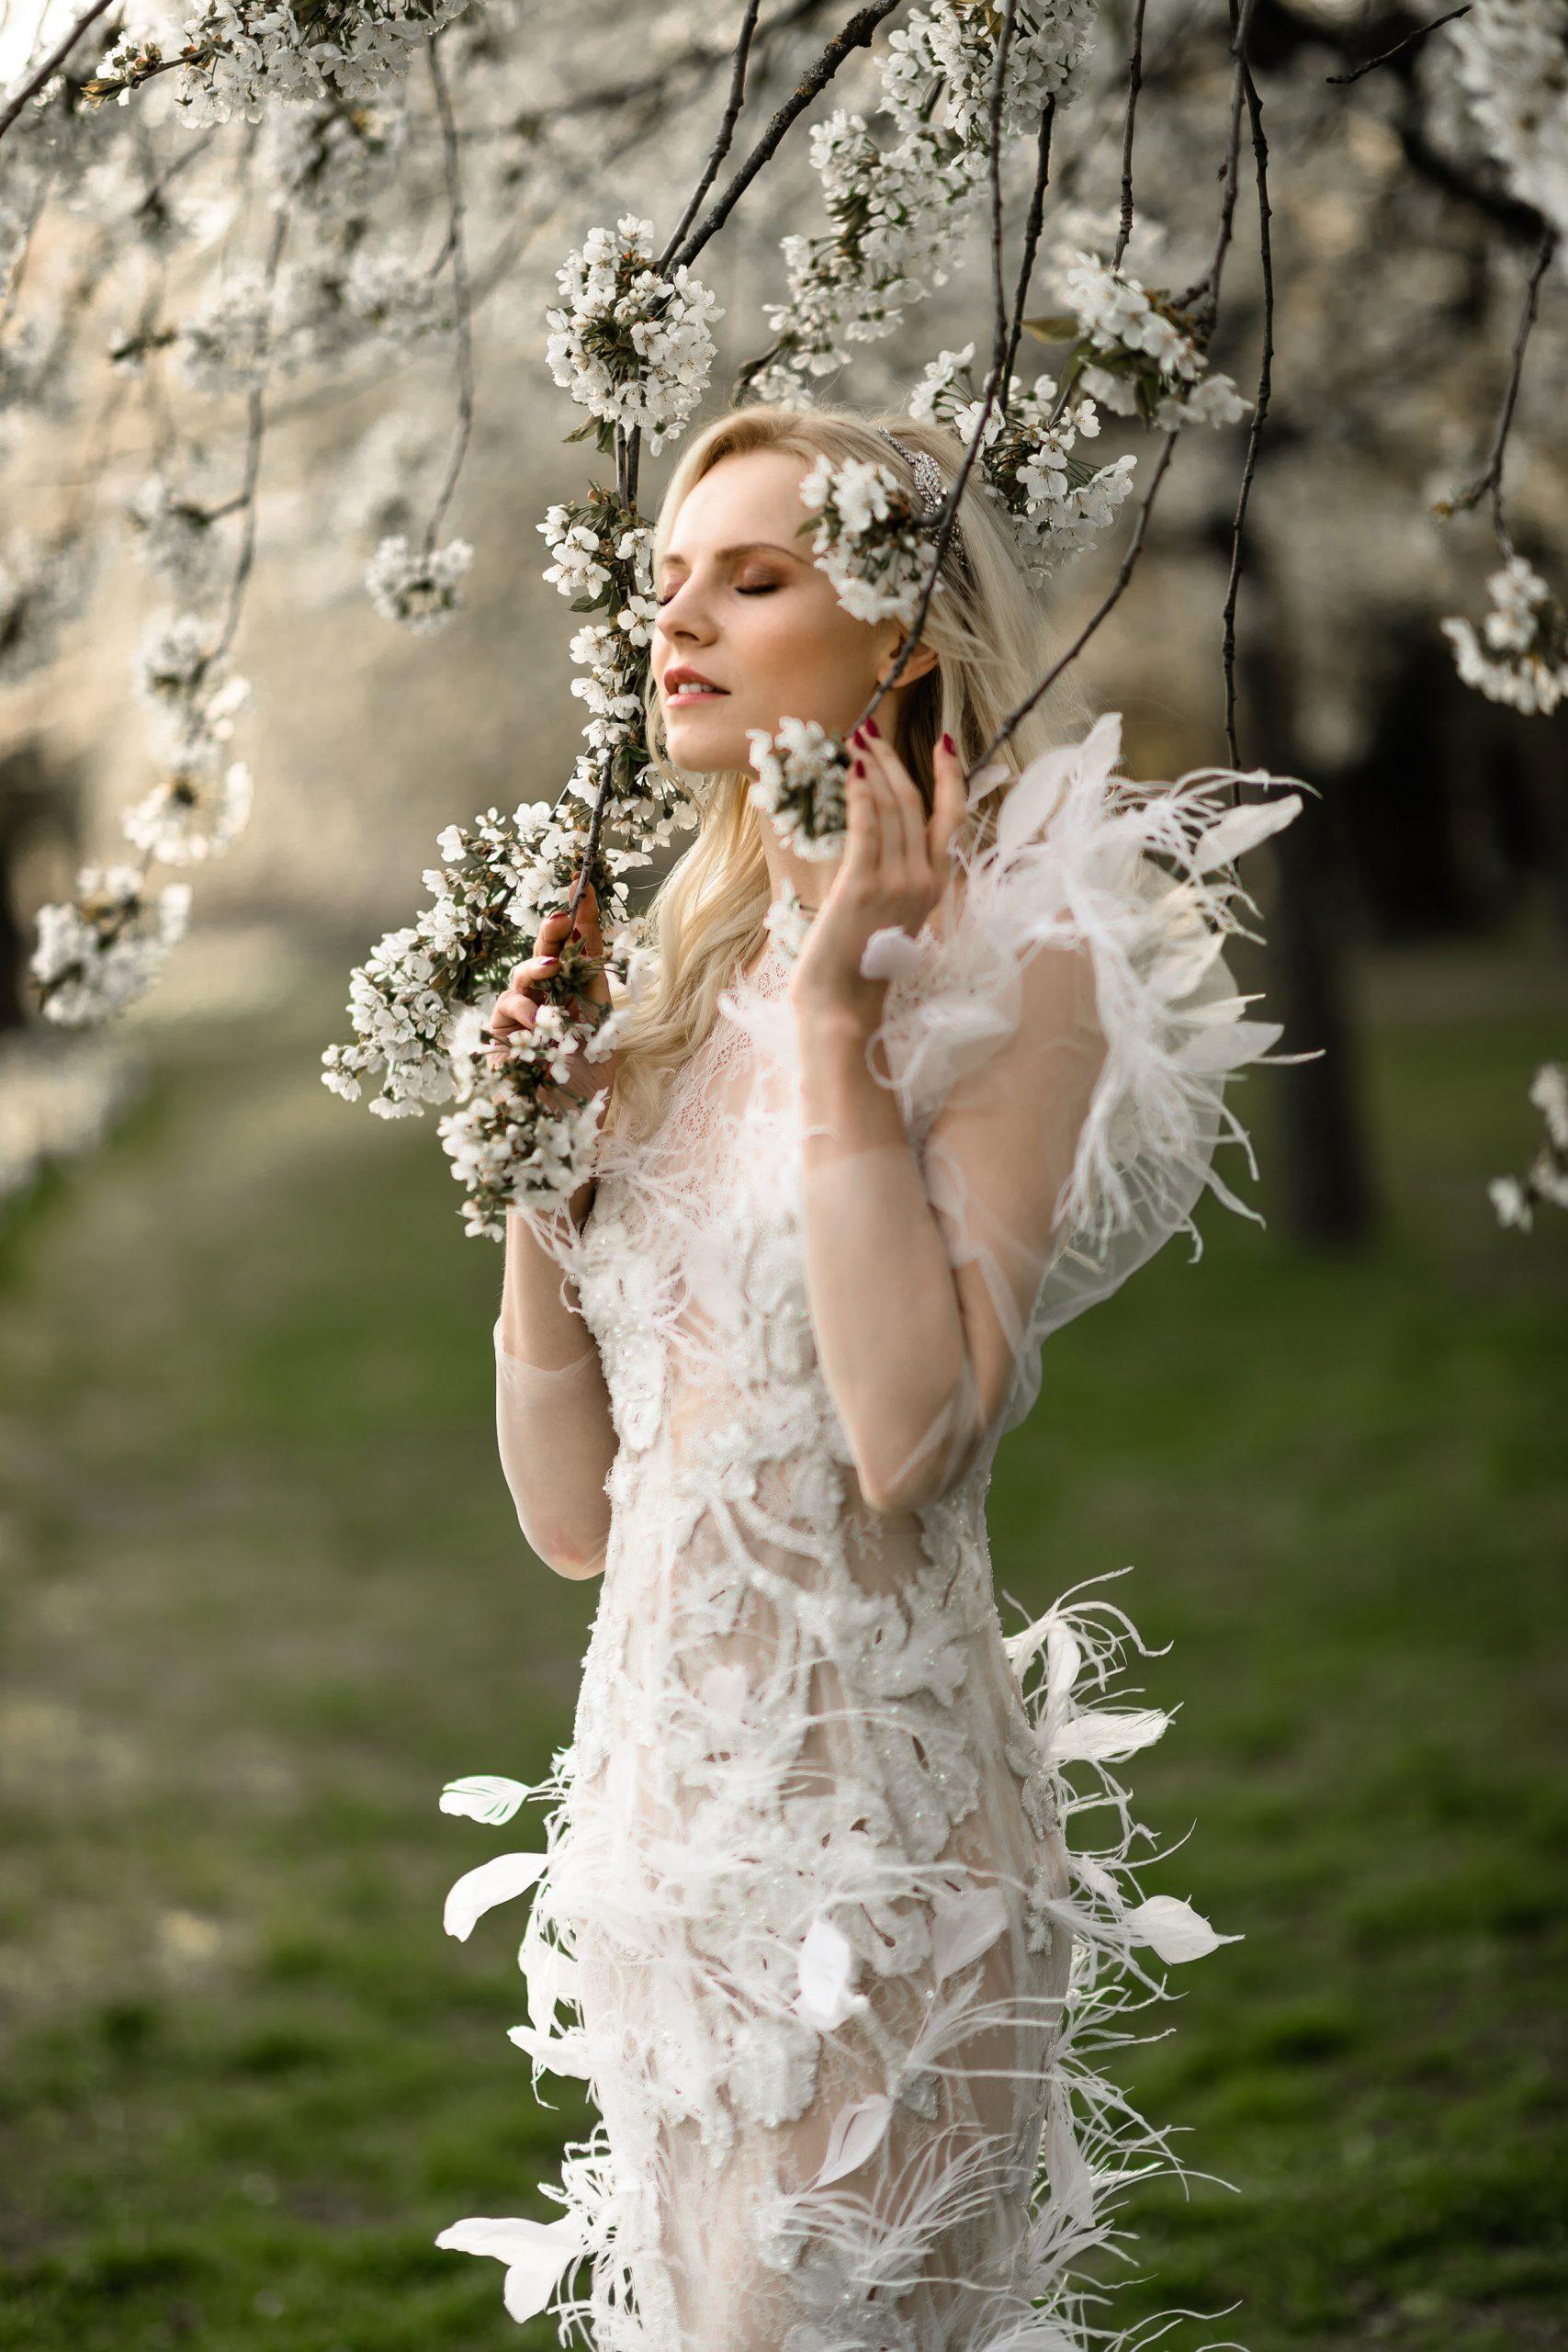 Feathers wedding dress- Modern Bride 2021